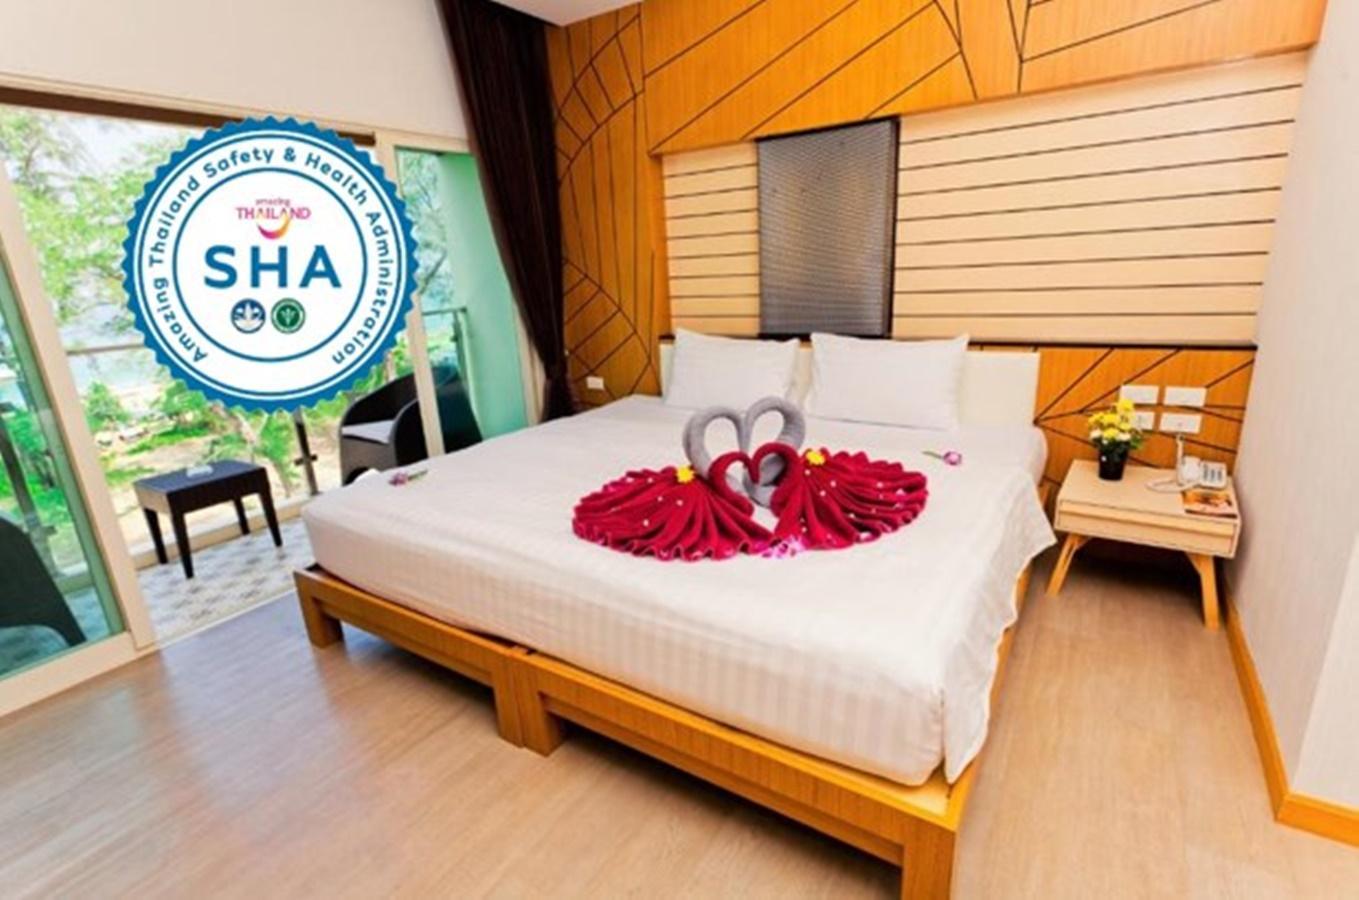 Anda Beachside Hotel (SHA Certified) - Image 0